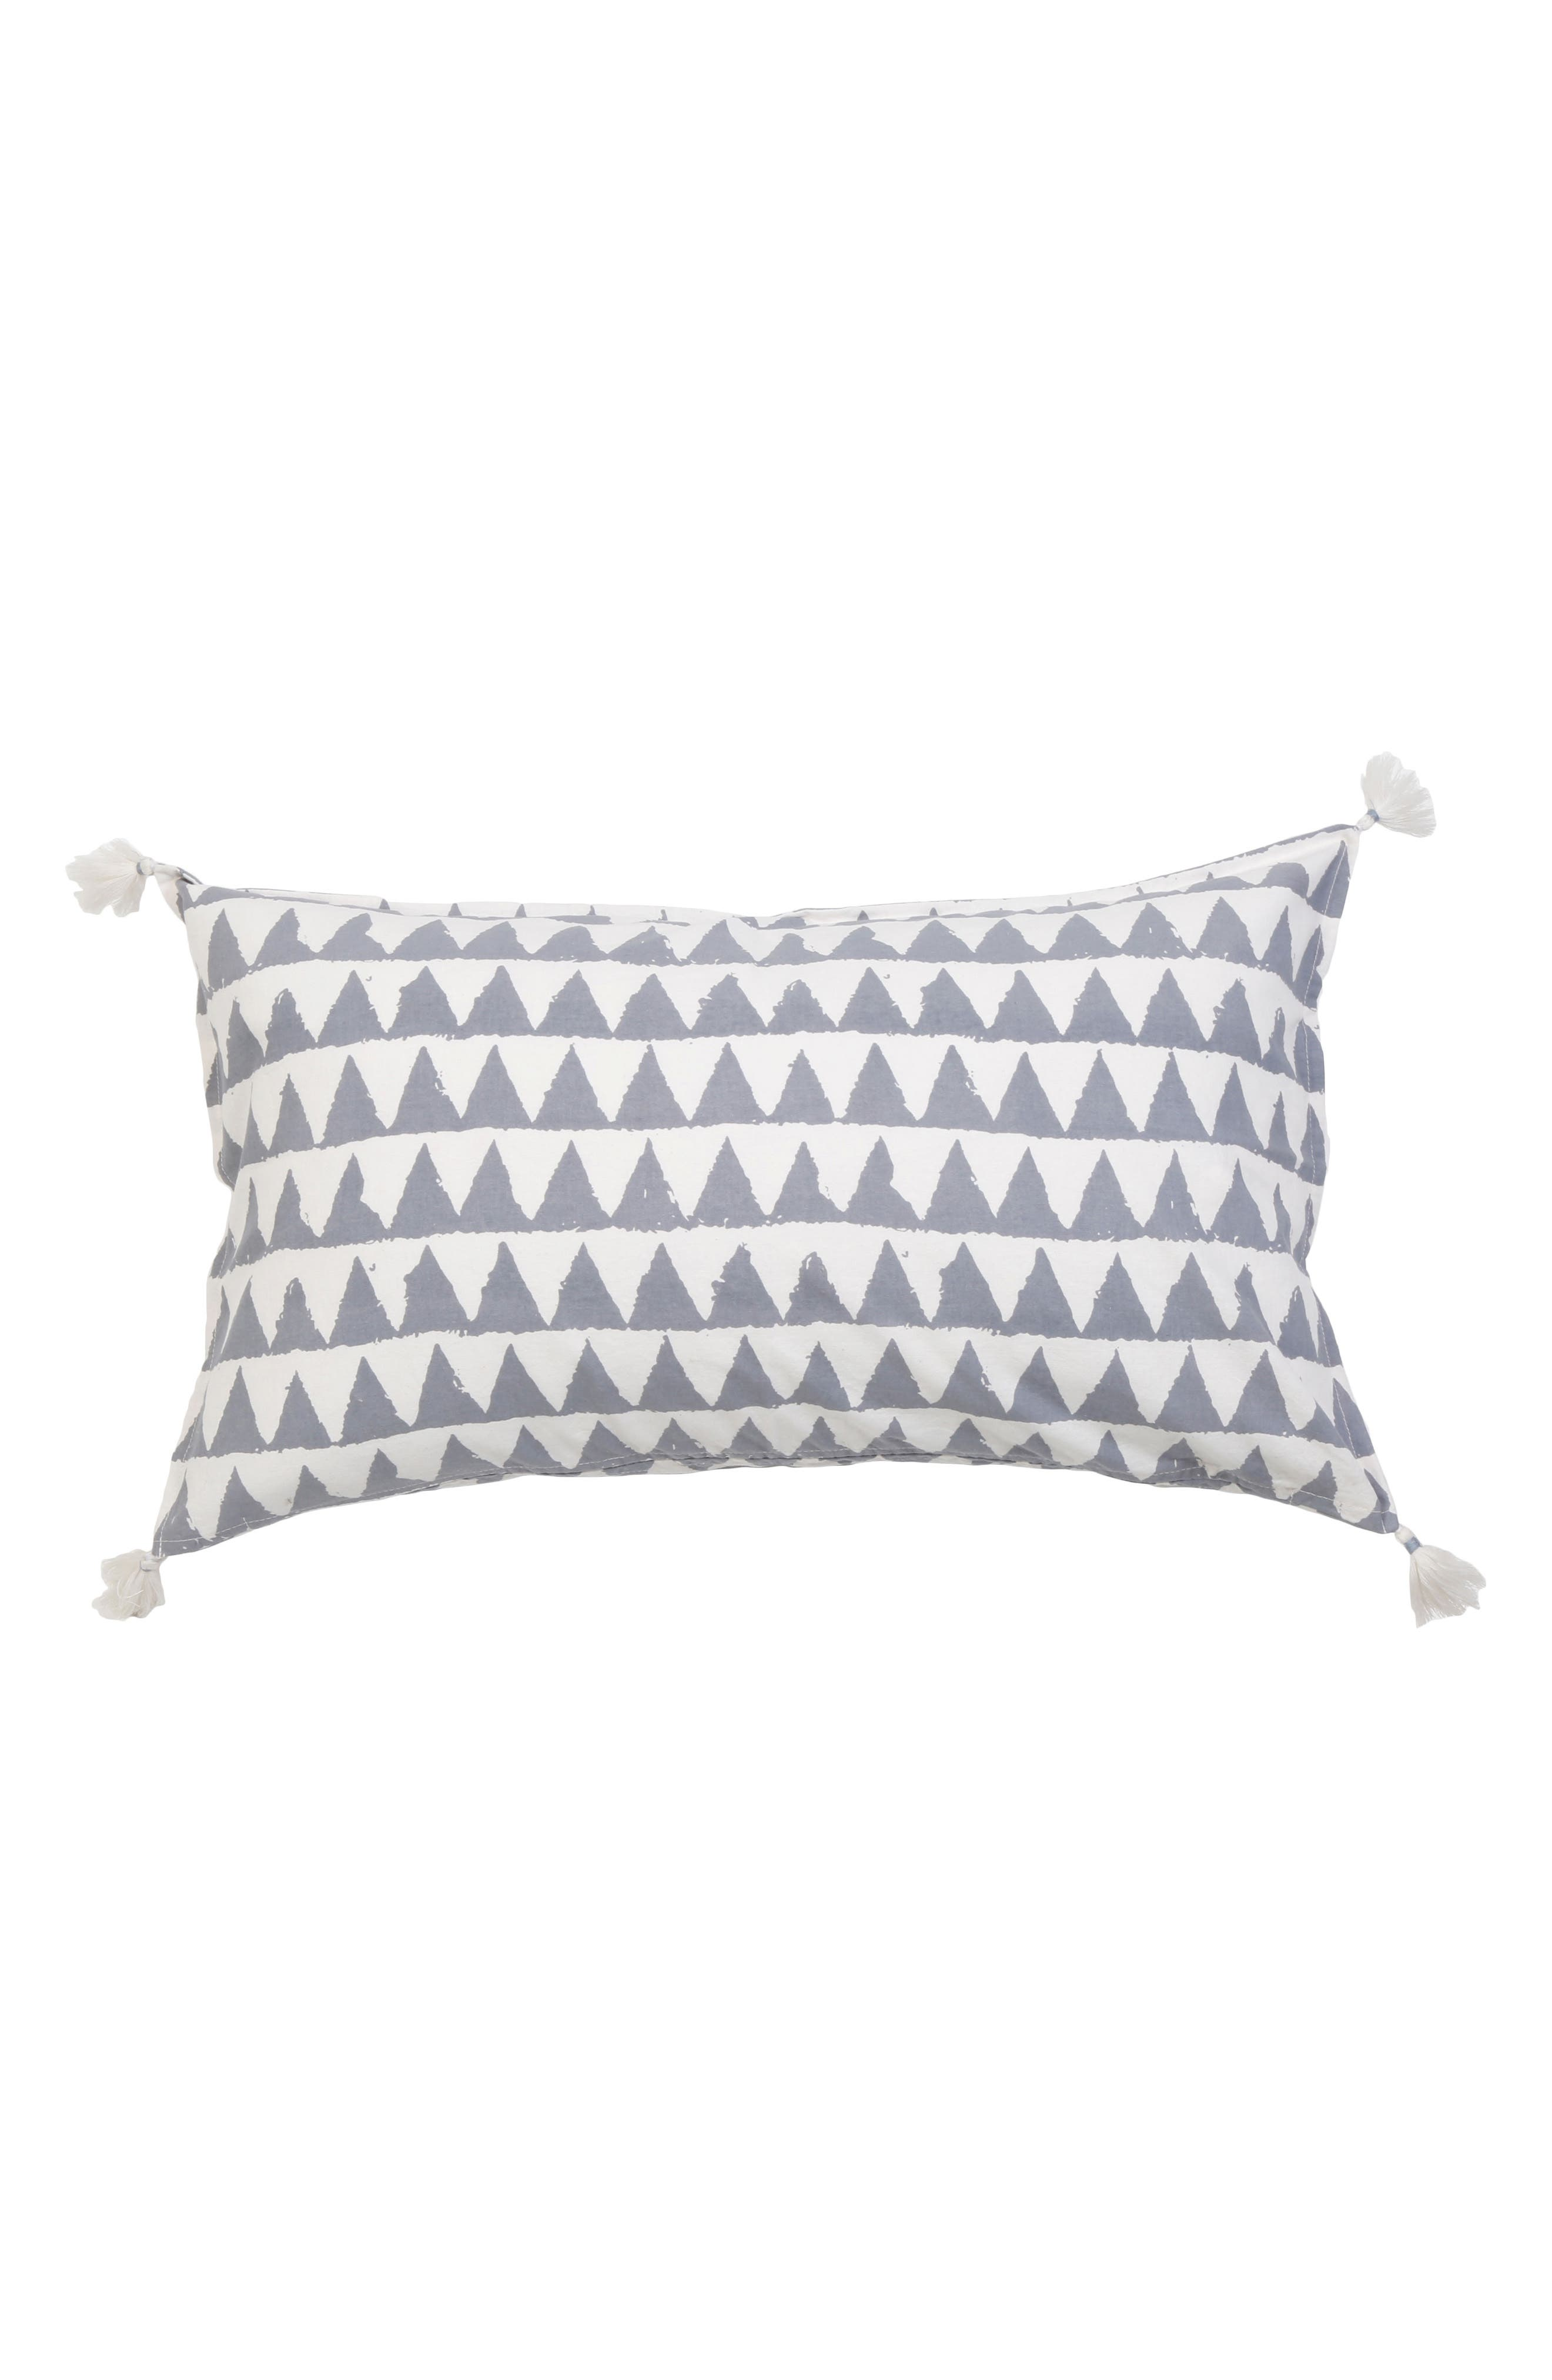 Summit Accent Pillow,                         Main,                         color, Blue Multi